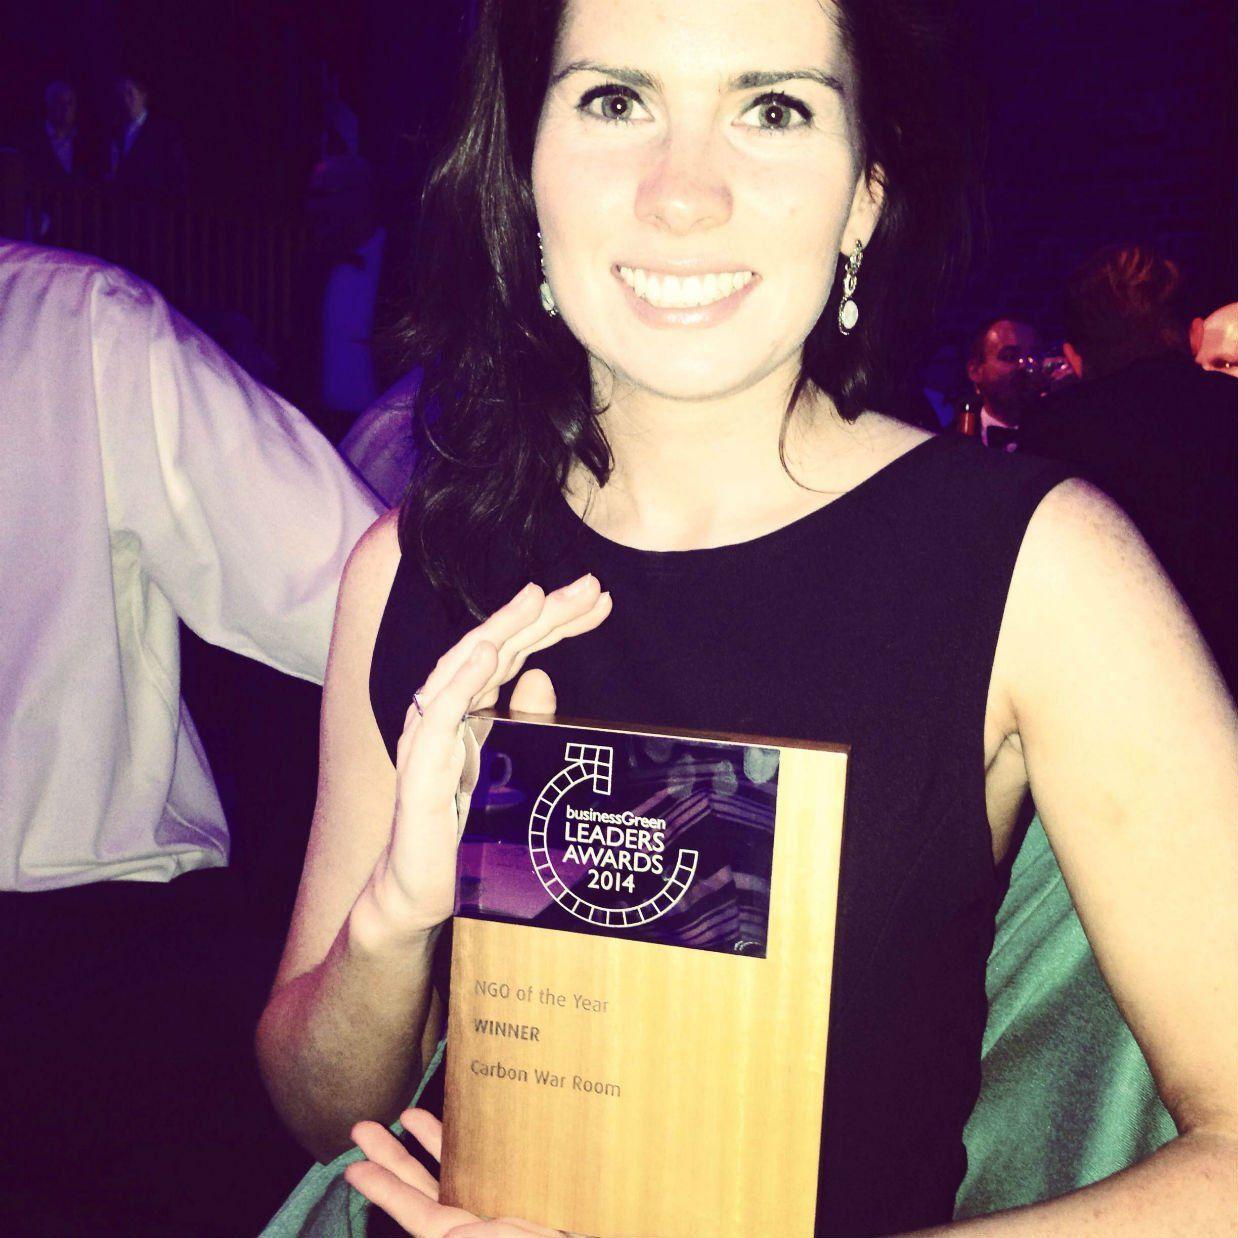 CWR Award